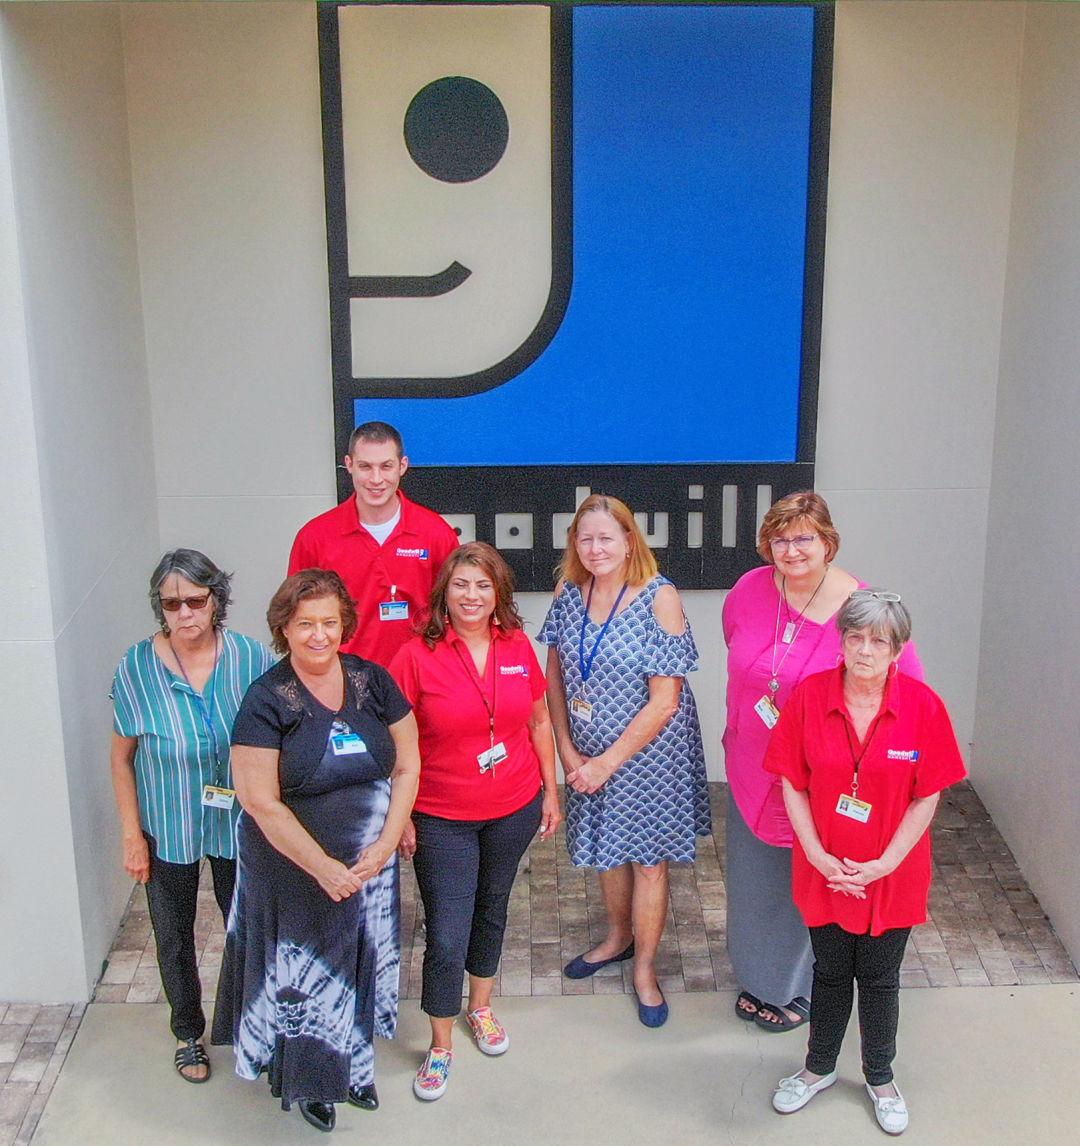 Goodwill Manasota GoodPartner Coaches (from l-r) Diana Olivieri, Ana Magadan, Josh Poling, Yolanda Garcia, Cathy Metcalfe, Dana Knuuti and Pamela Bavo